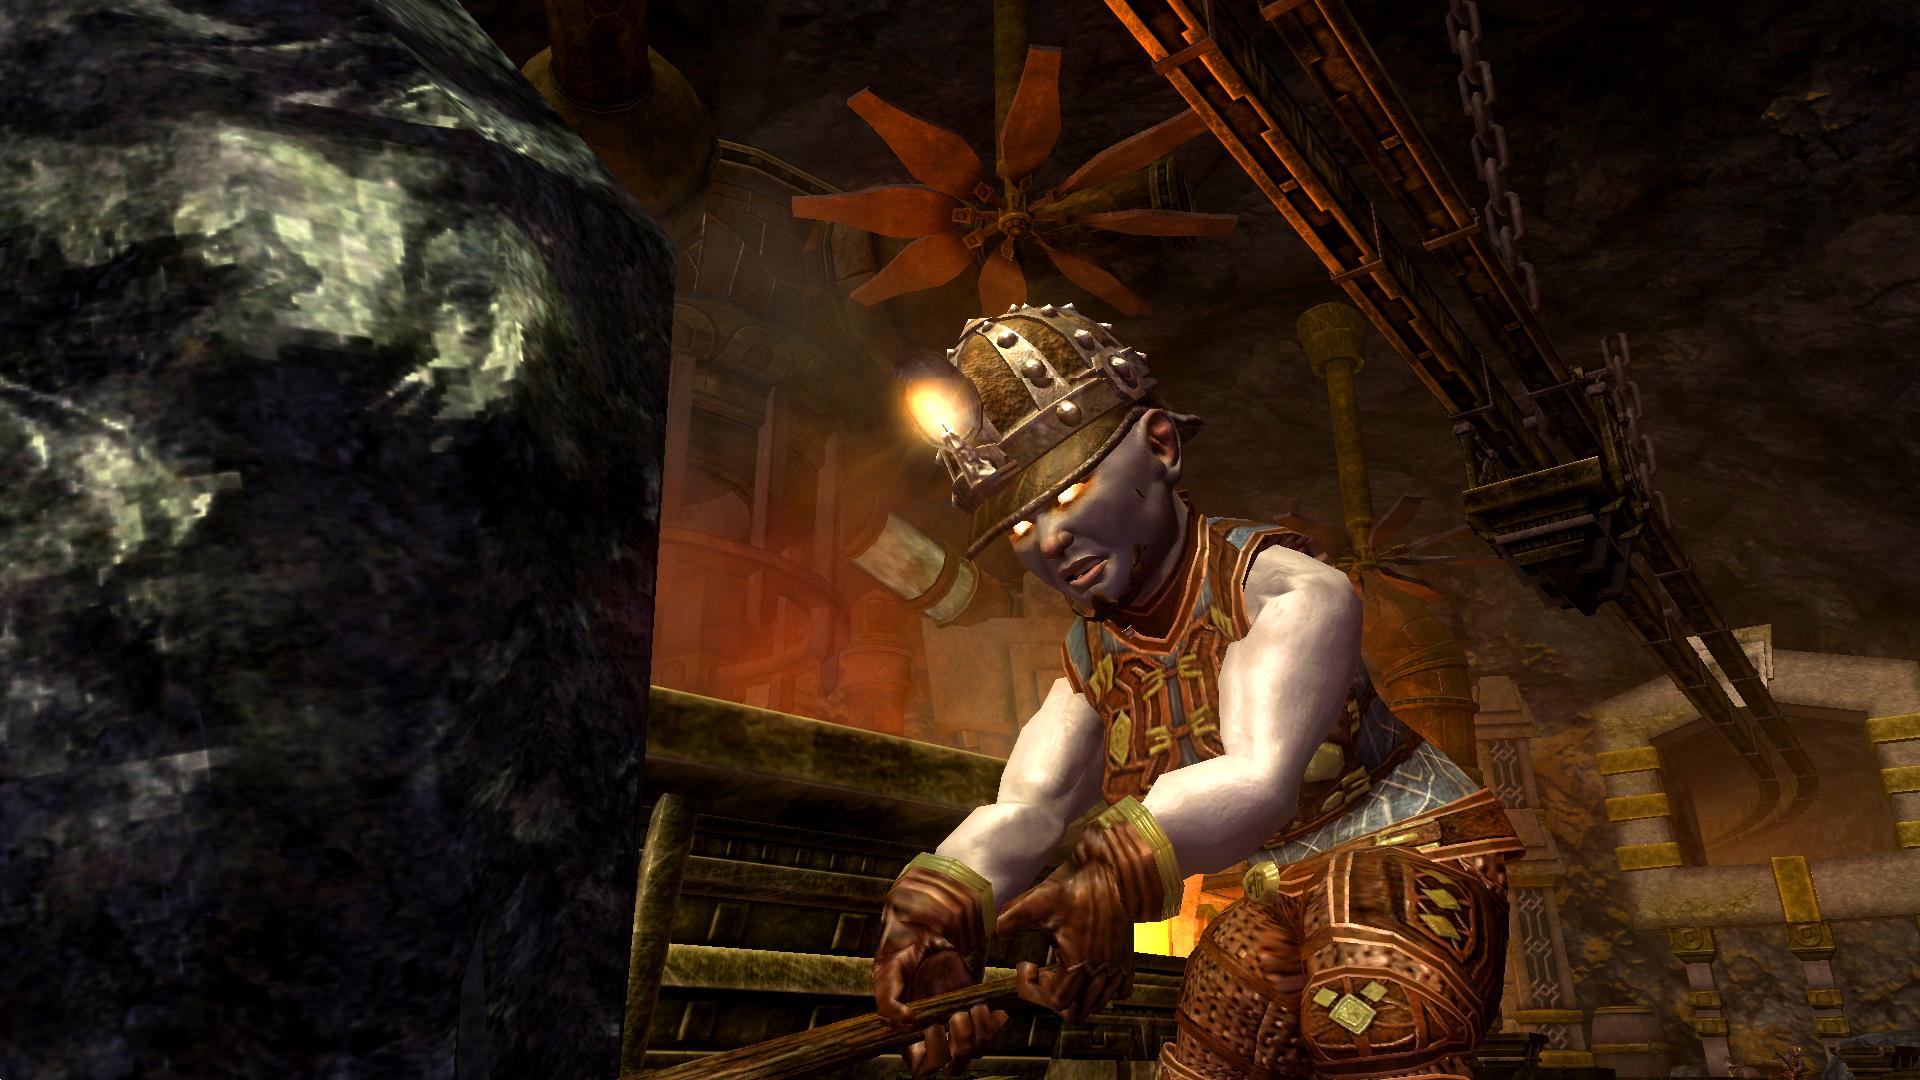 EverQuest II : Terrors of Thalumbra on Steam